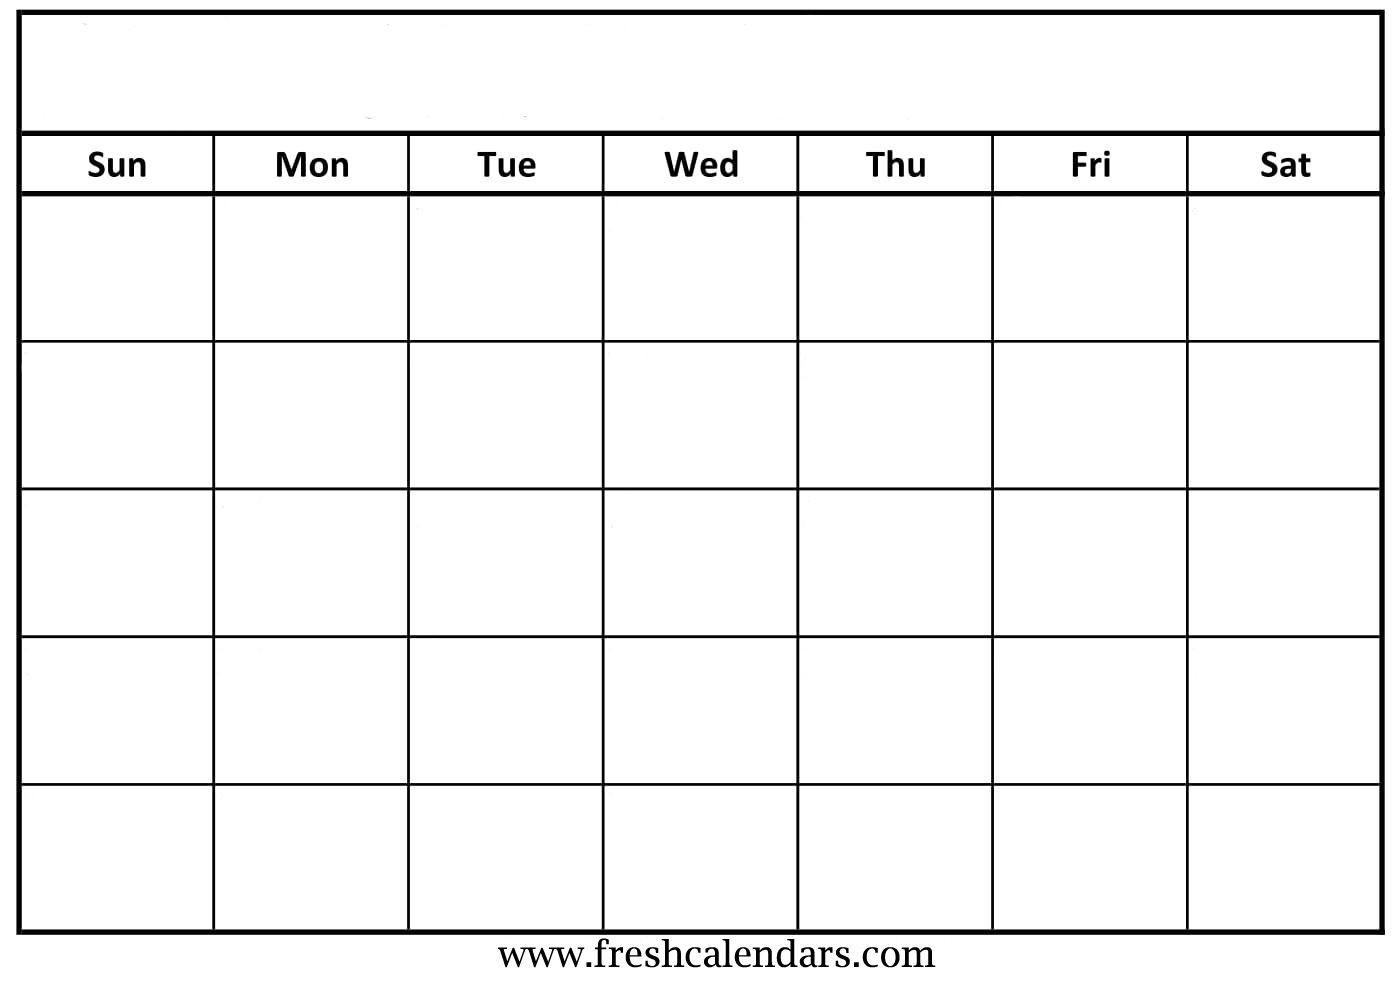 Blank Calendar: Wonderfully Printable 2019 Templates-Calendar Blank With Numbers And Printable